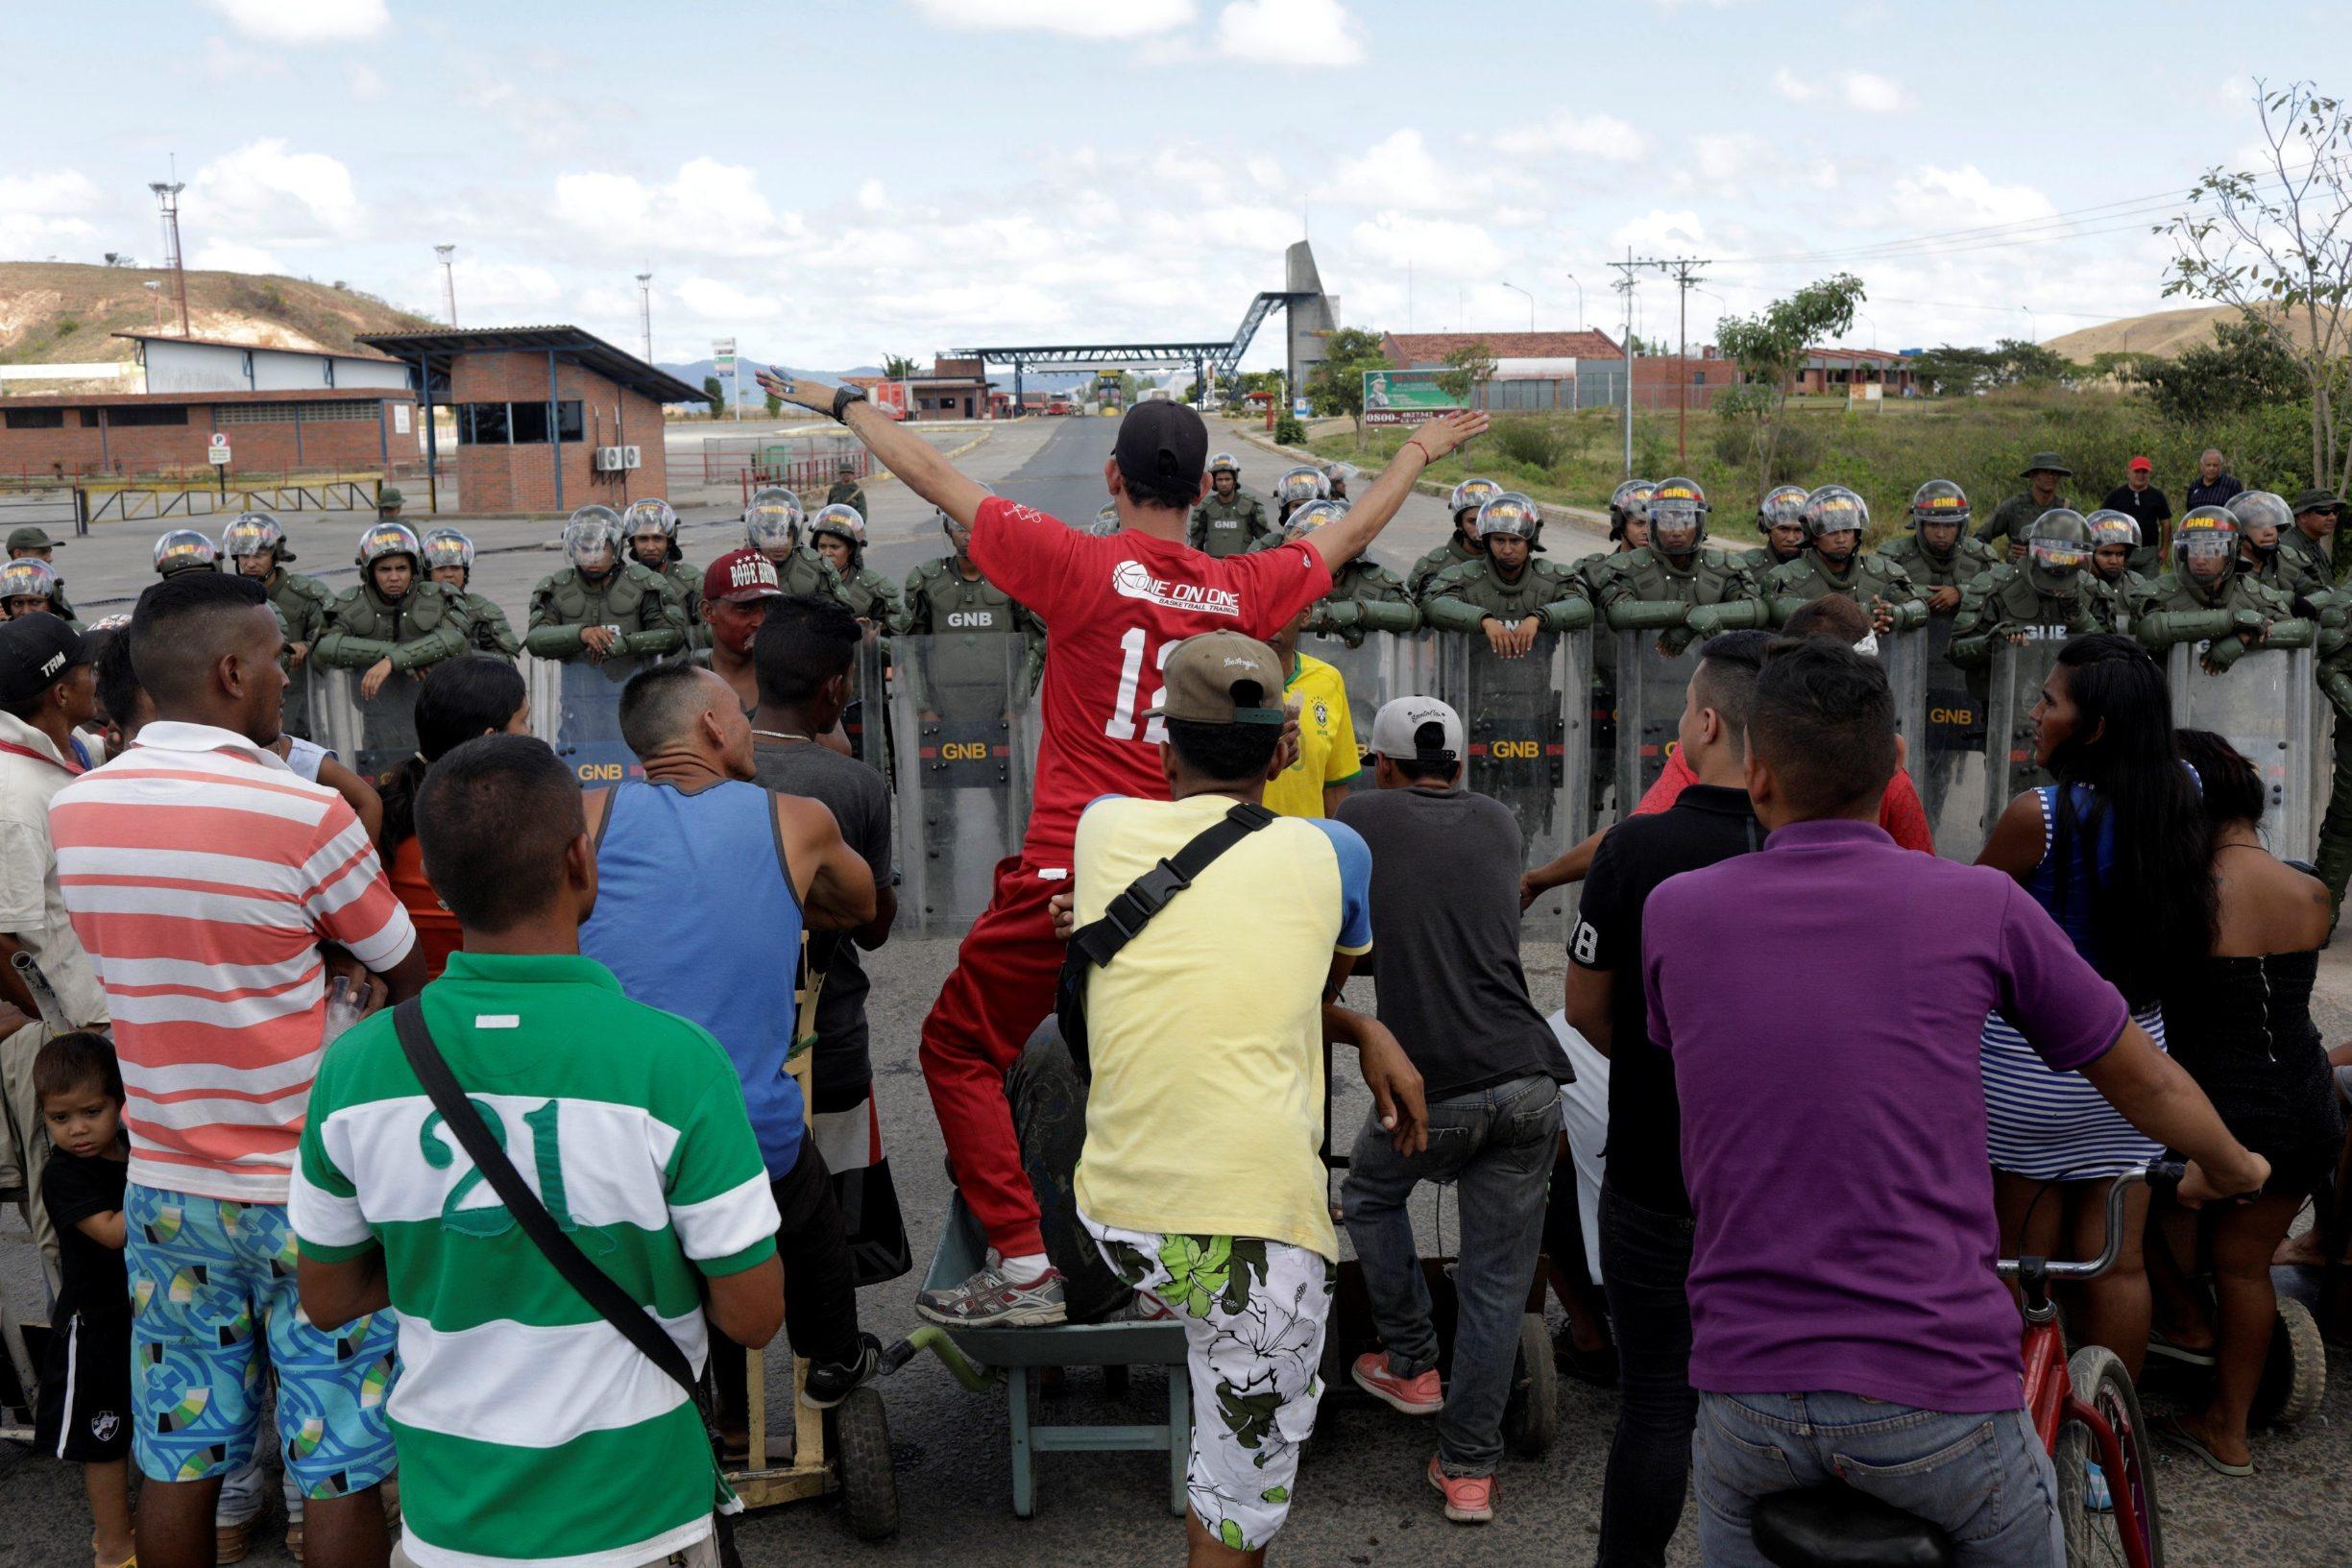 People waiting to cross to Venezuela stand opposite Venezuelan National guards at the border between Venezuela and Brazil in Pacaraima, Roraima state, Brazil, February 22, 2019. REUTERS/Ricardo Moraes